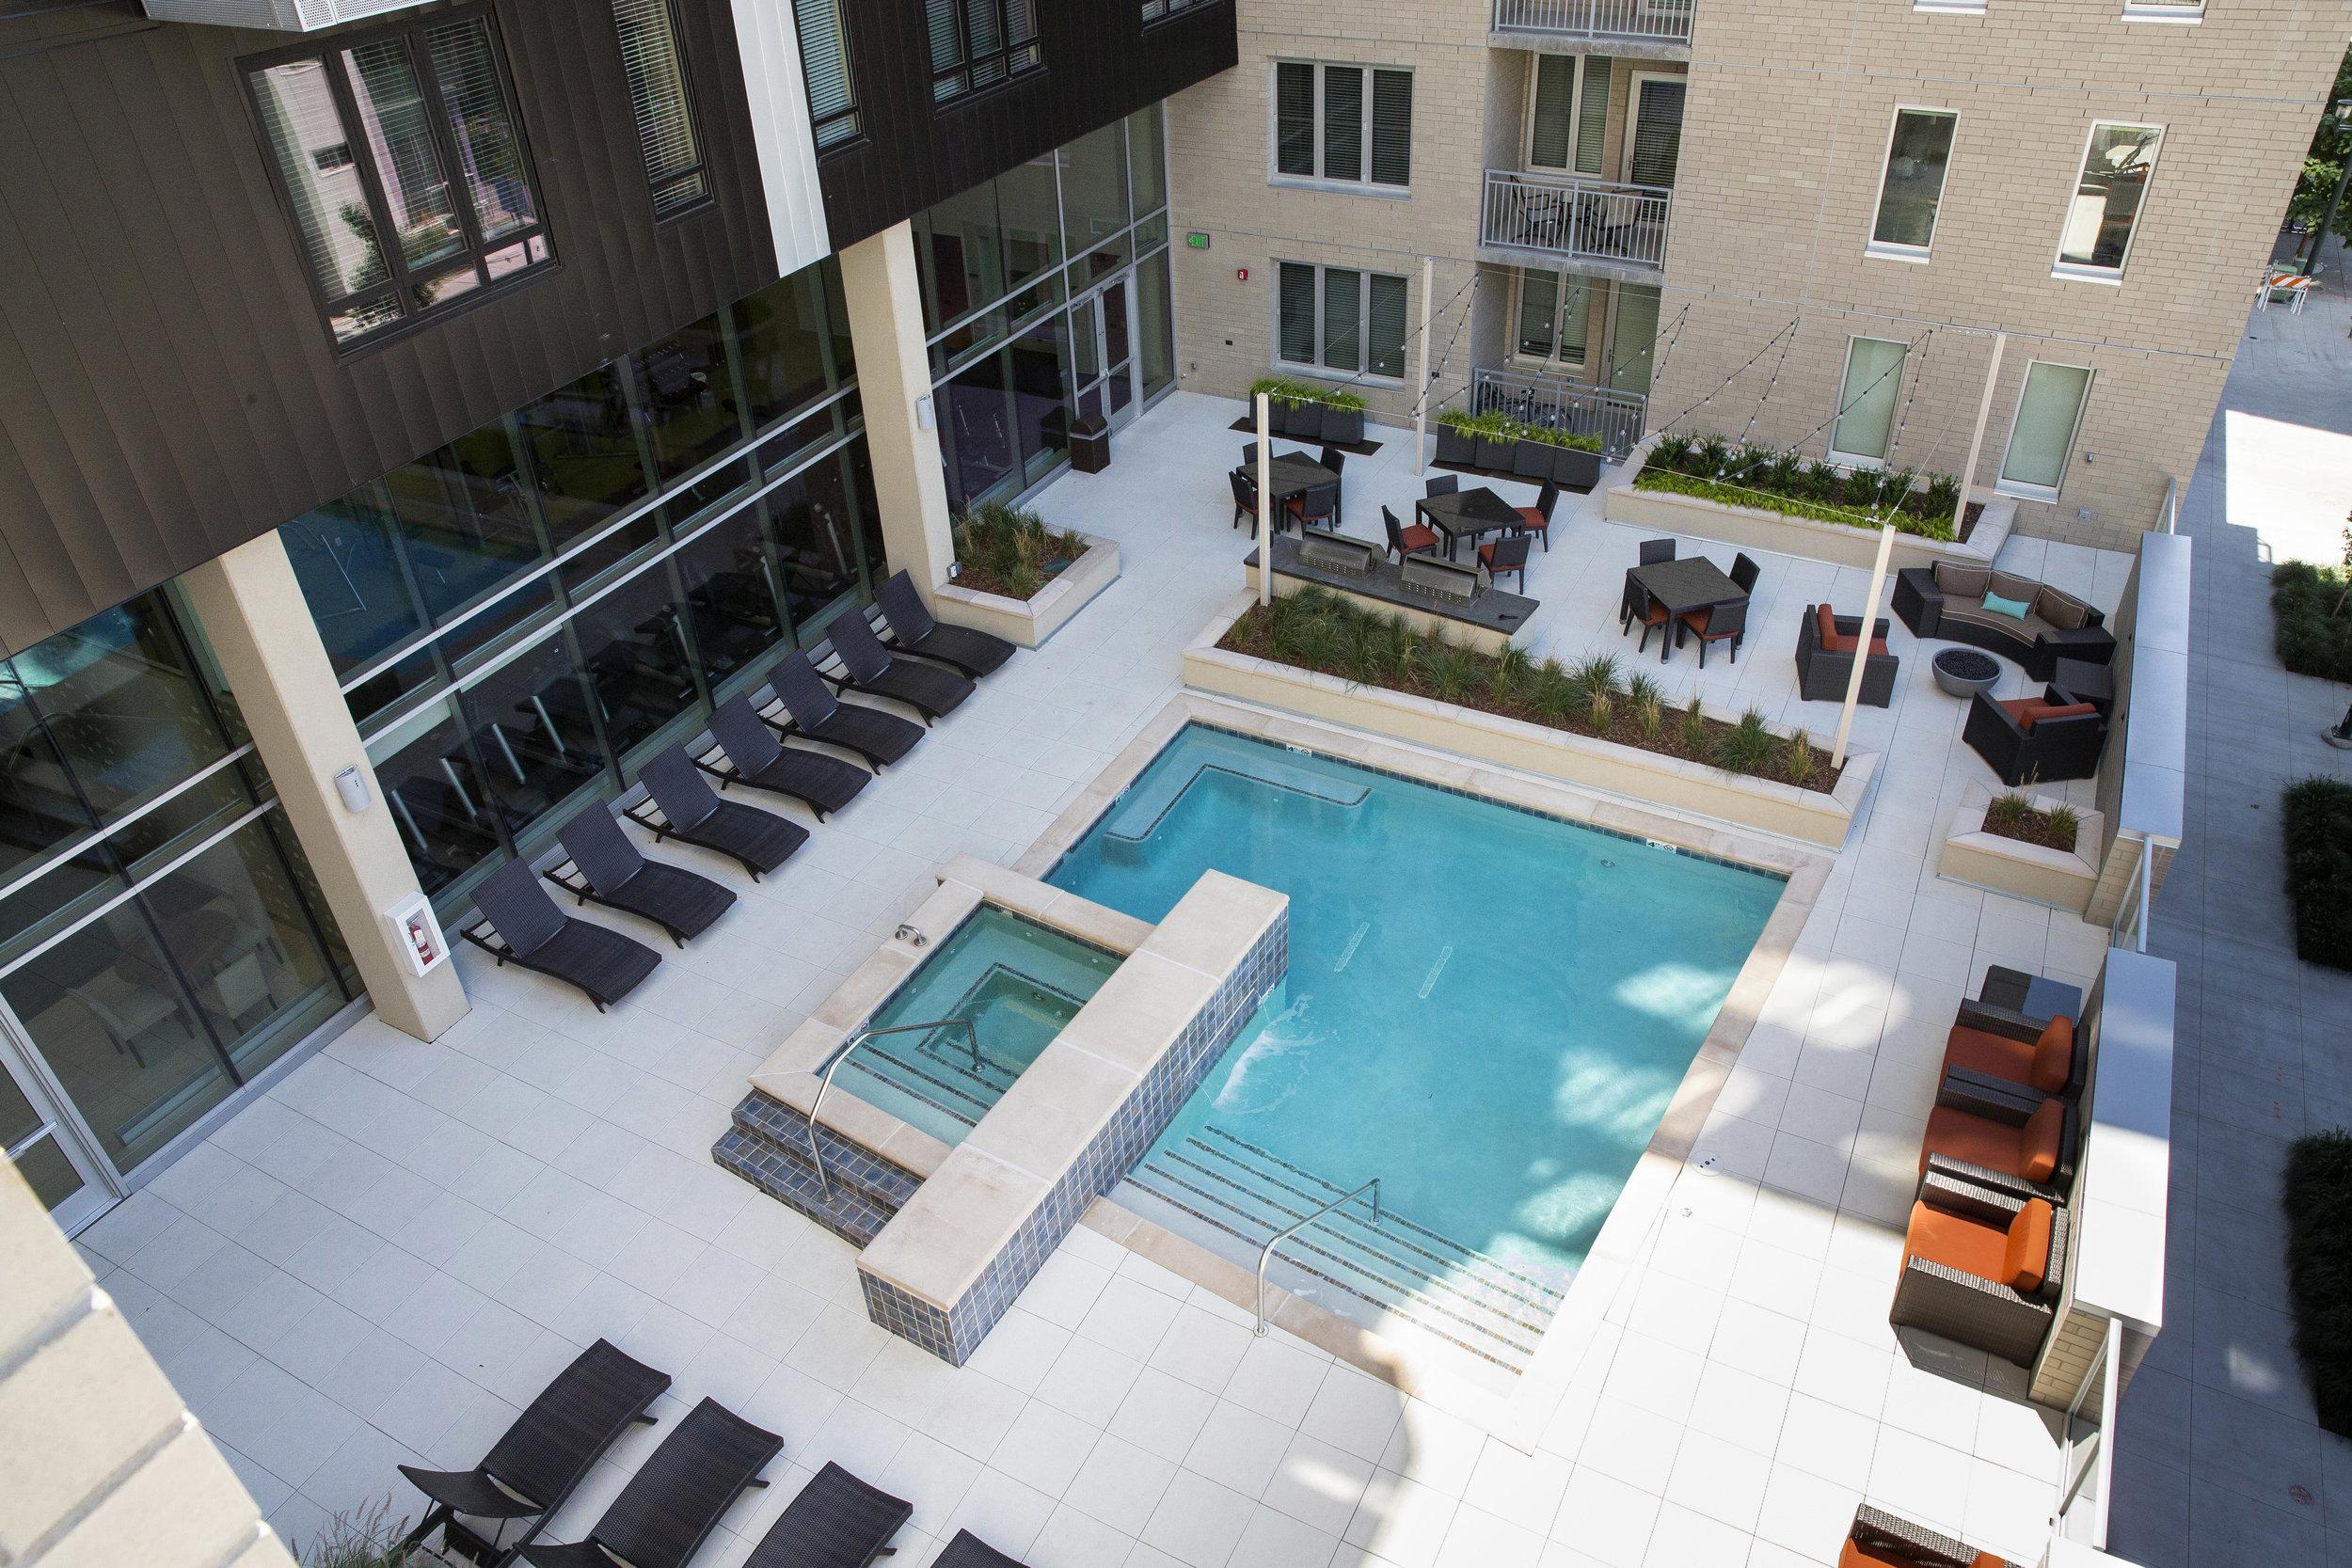 <f>Markets</f><f>Residential</f><f>Services</f><f>LandscapeArchitecture</f><t>The Verve</t><m>Denver, CO</m>